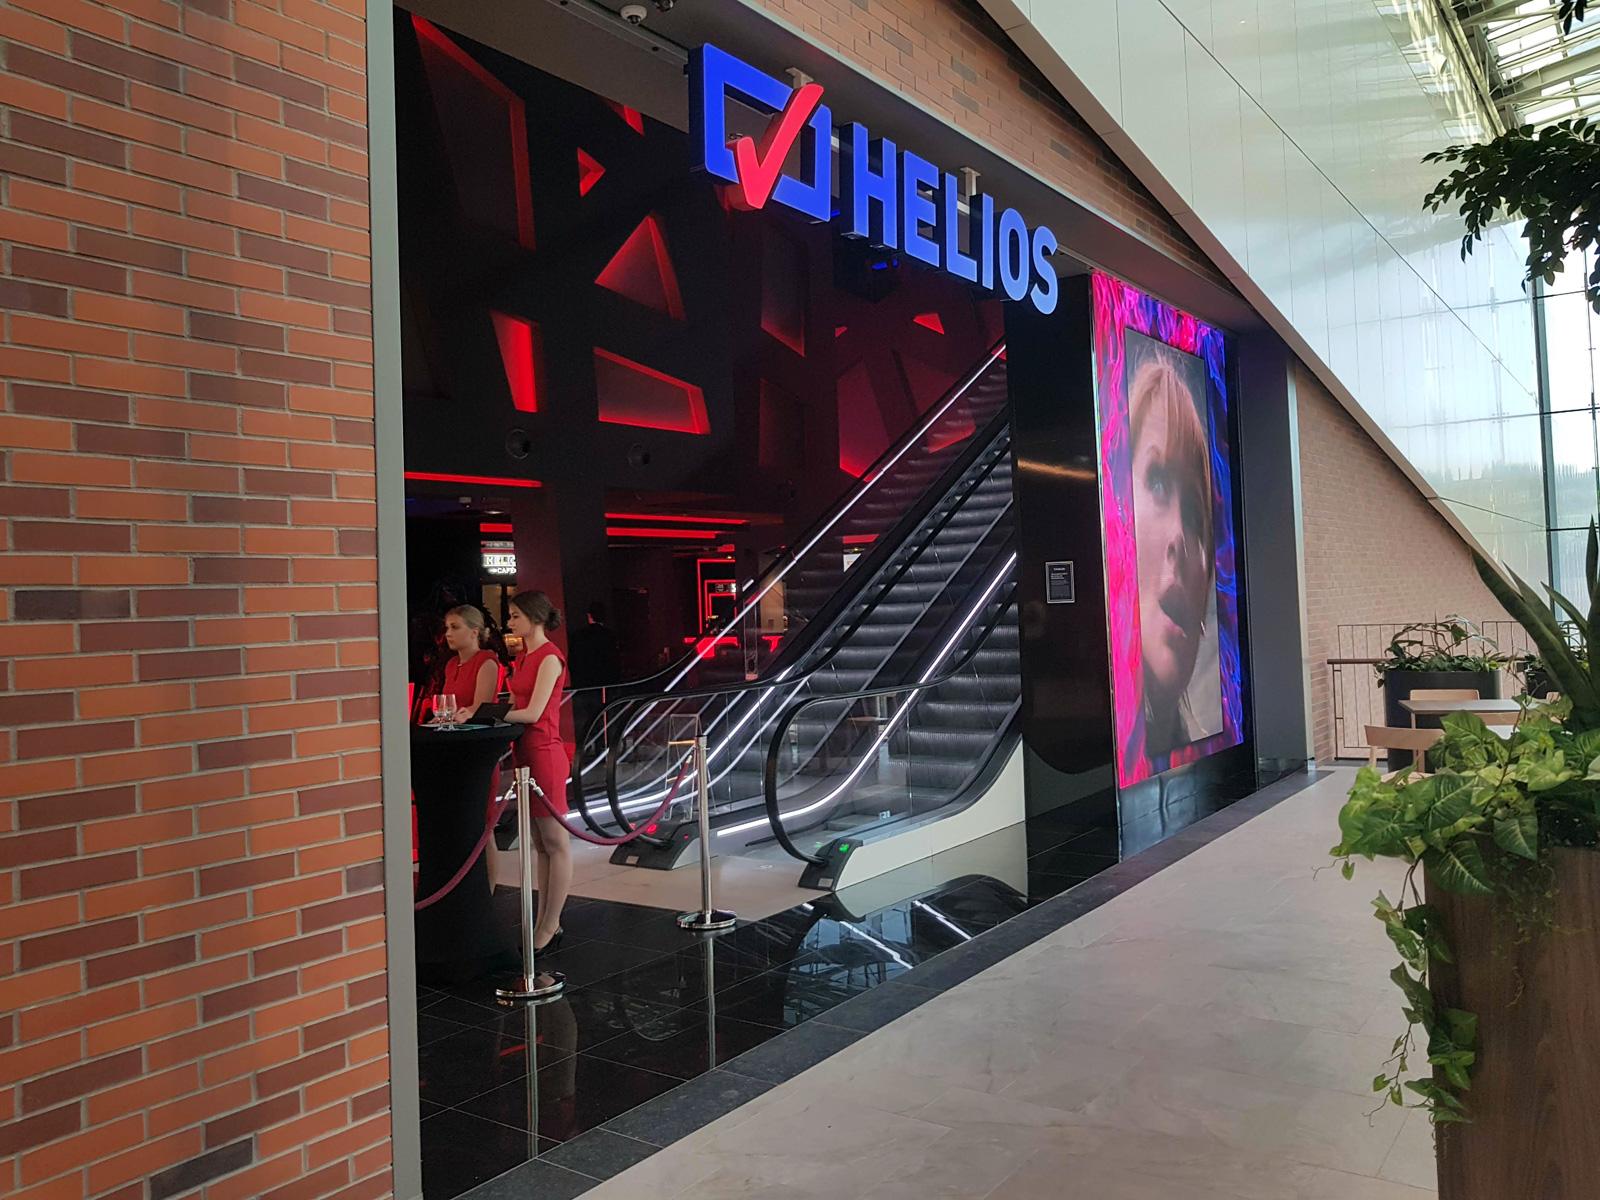 Helios-Forum-Gdansk-Poland-Cinema-Entrance-from-Mall-Patrick-von-Sychowski.jpg